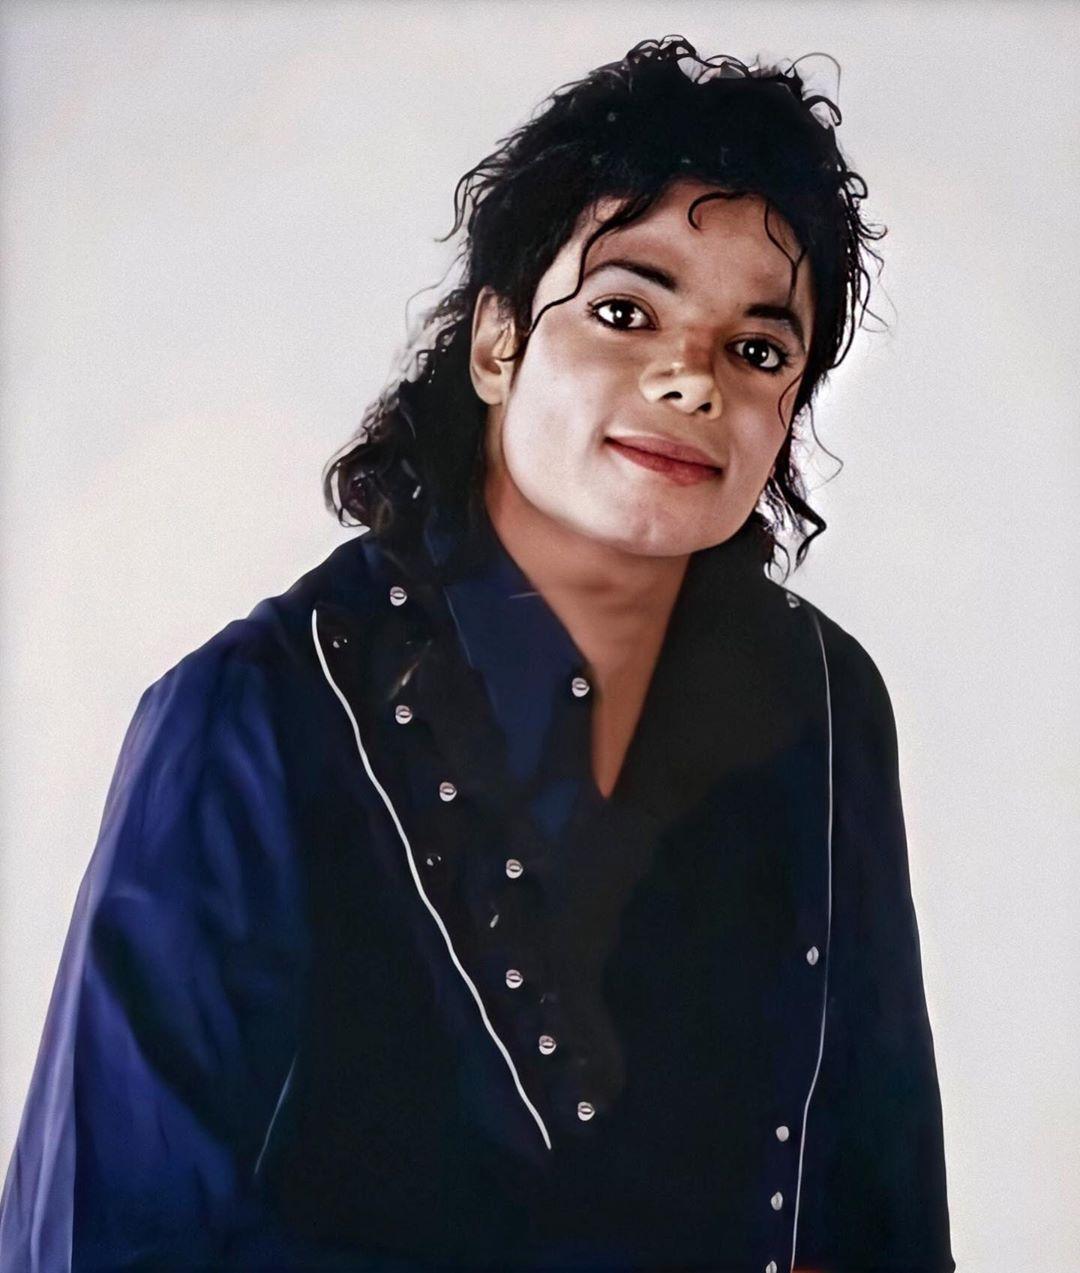 Pin De Gina Pereira Em Michael Jackson Faces Michael Jackson